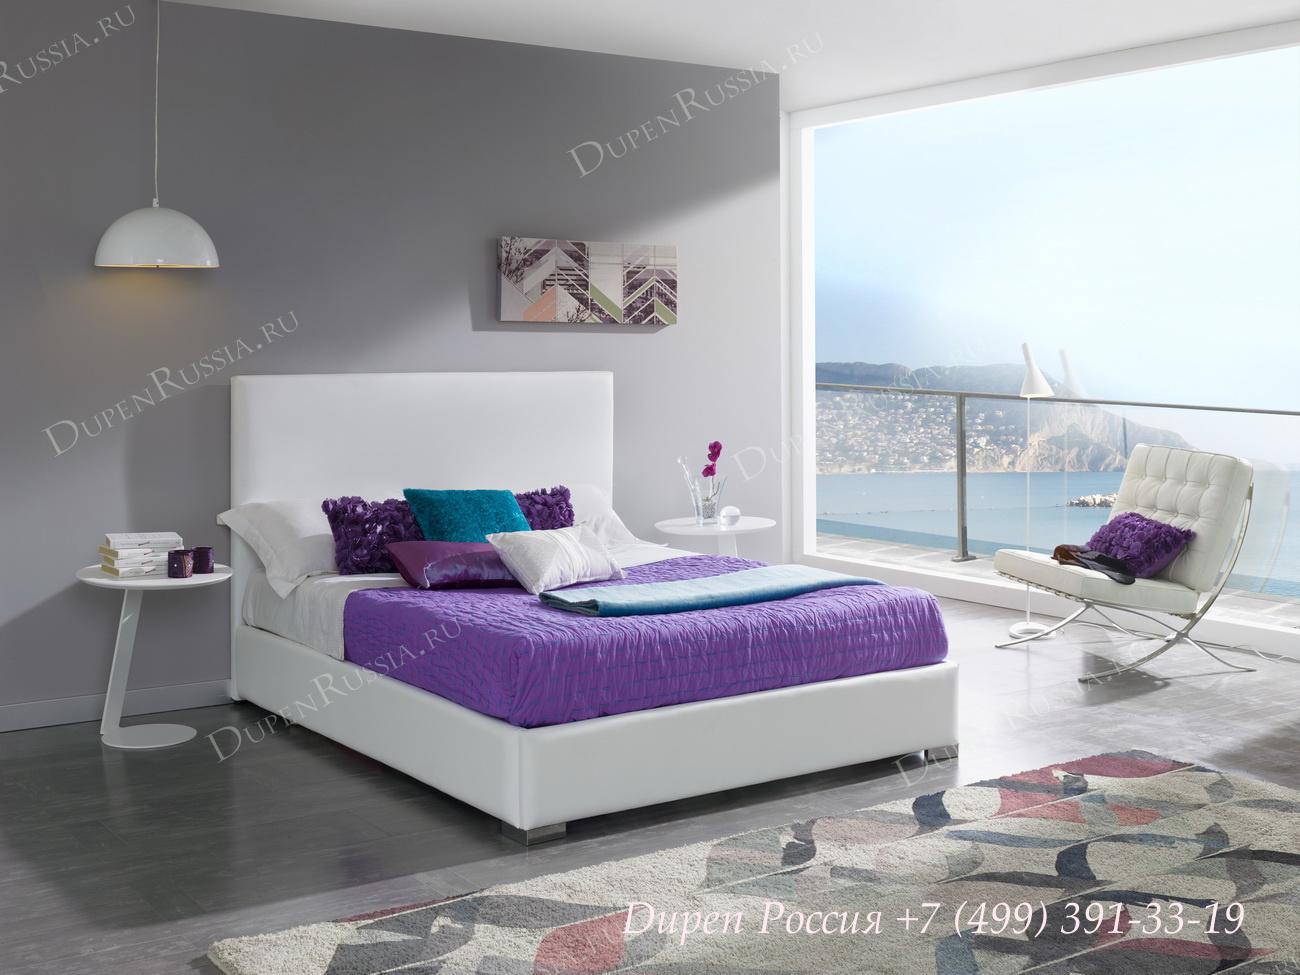 Кровать Dupen 703 Picolo, Тумба Dupen М-129